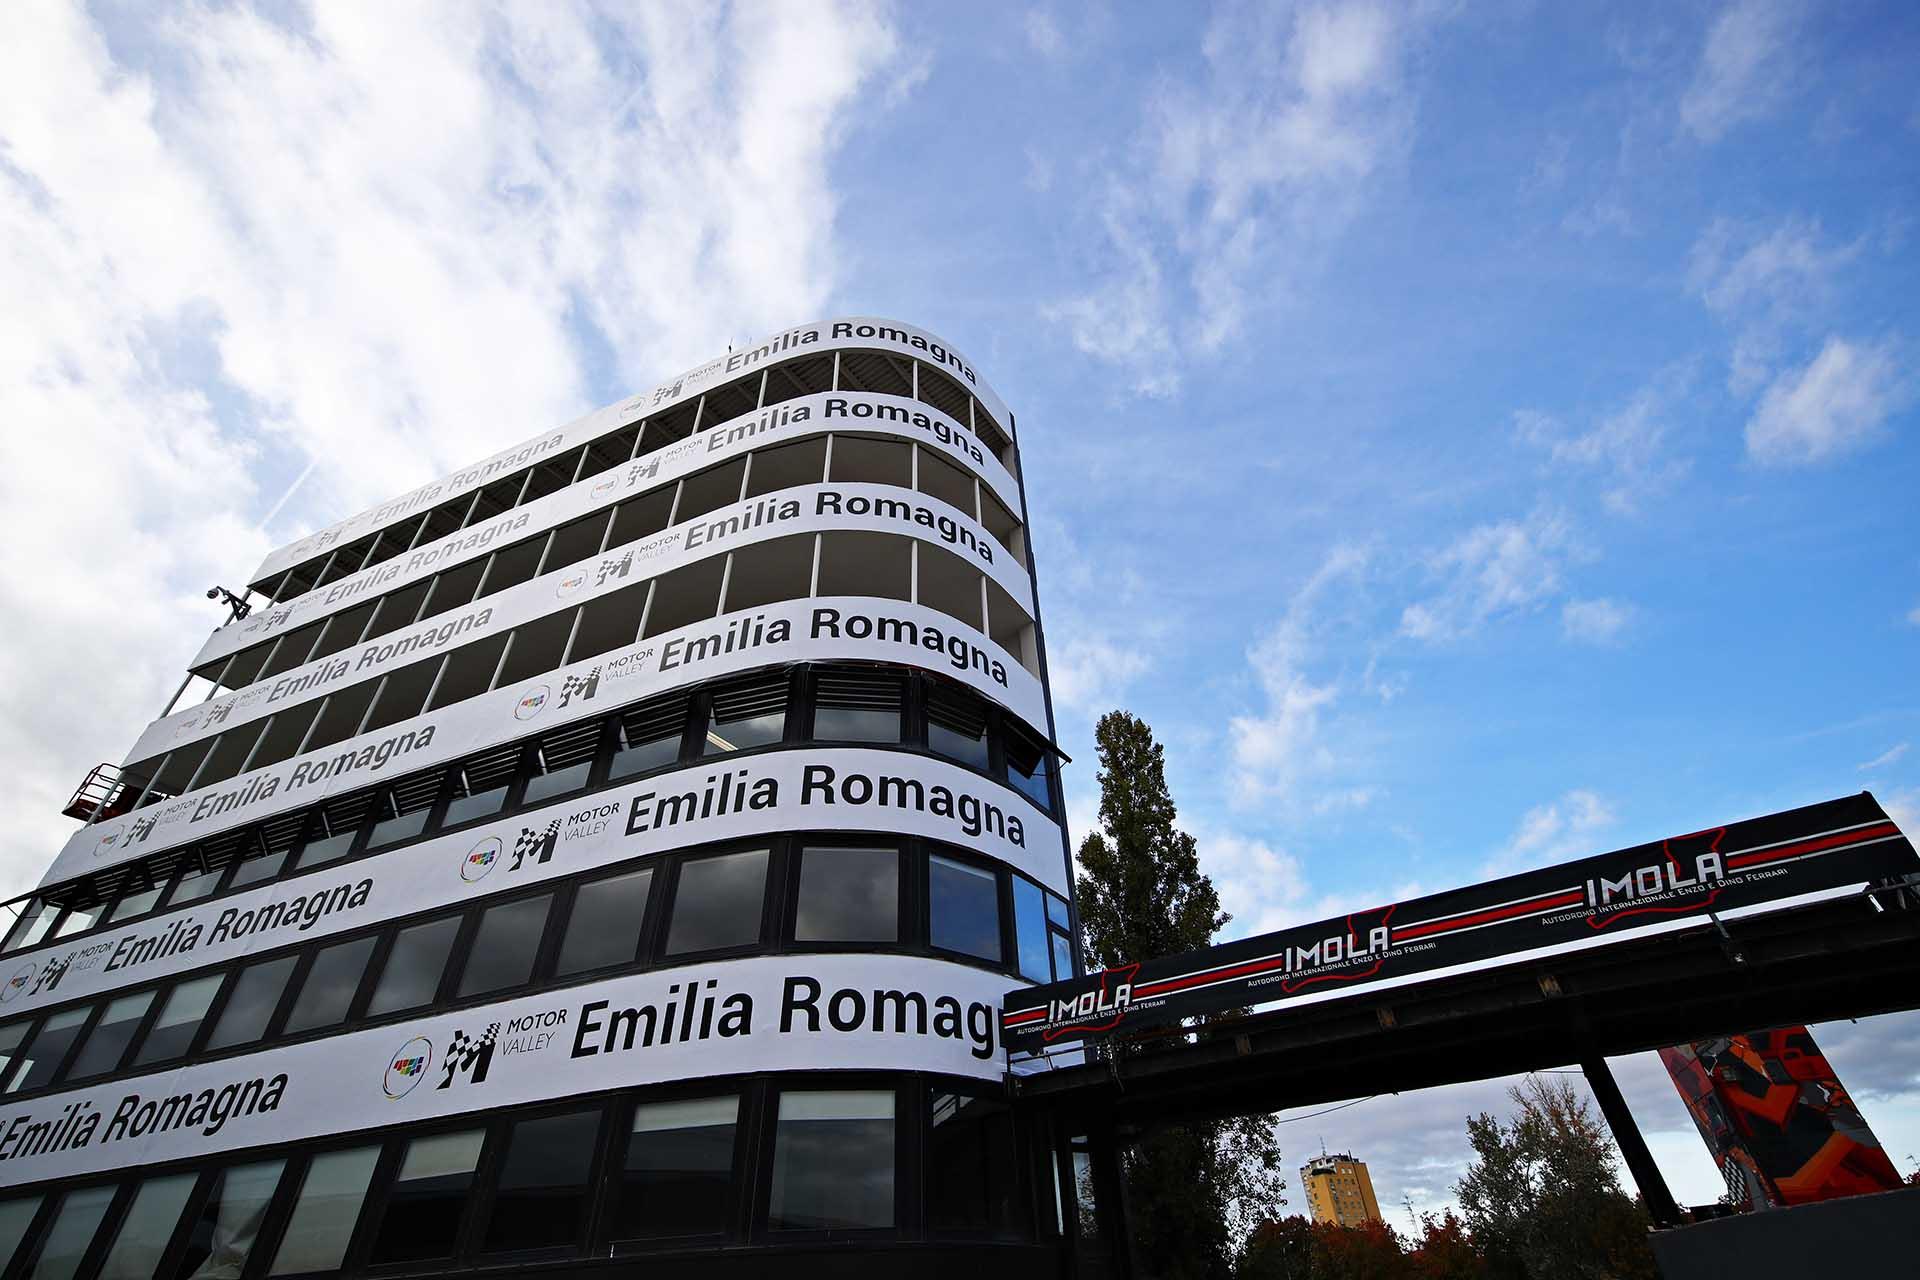 F1 Grand Prix of Emilia Romagna - Previews